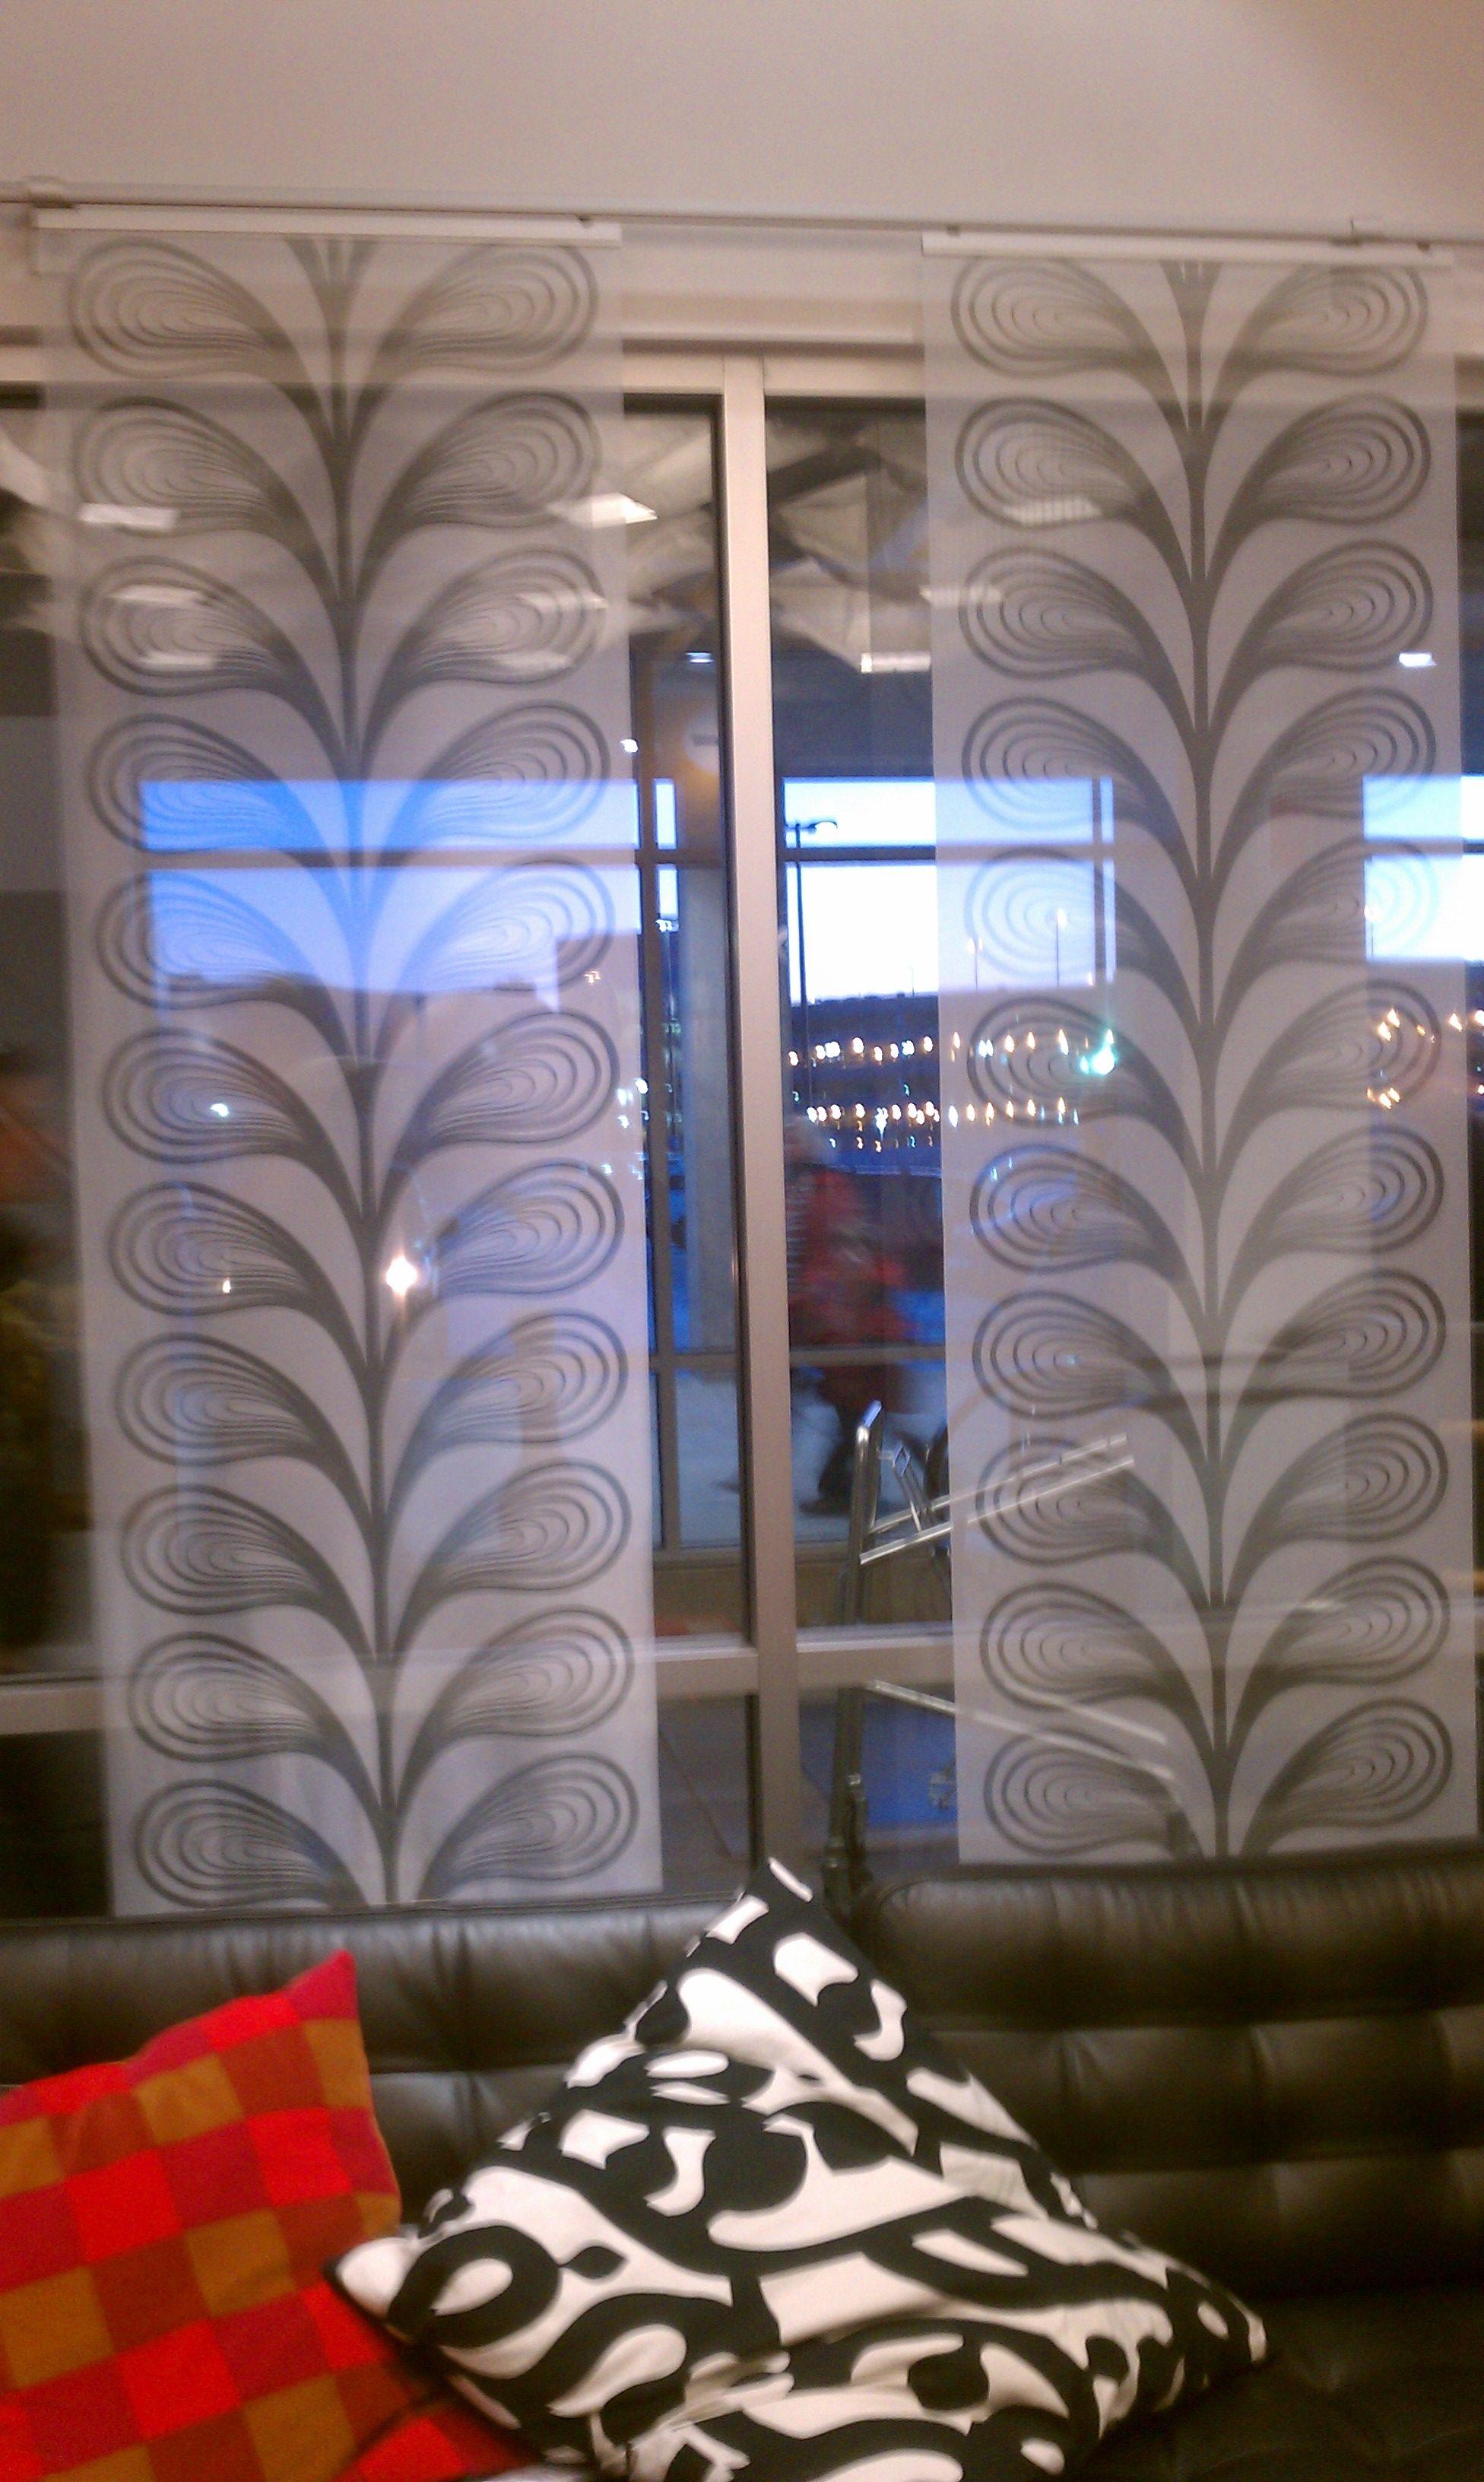 Ikea Panel Curtain Insitu Google Search: $10 Kajsa Panel Curtain Ikea